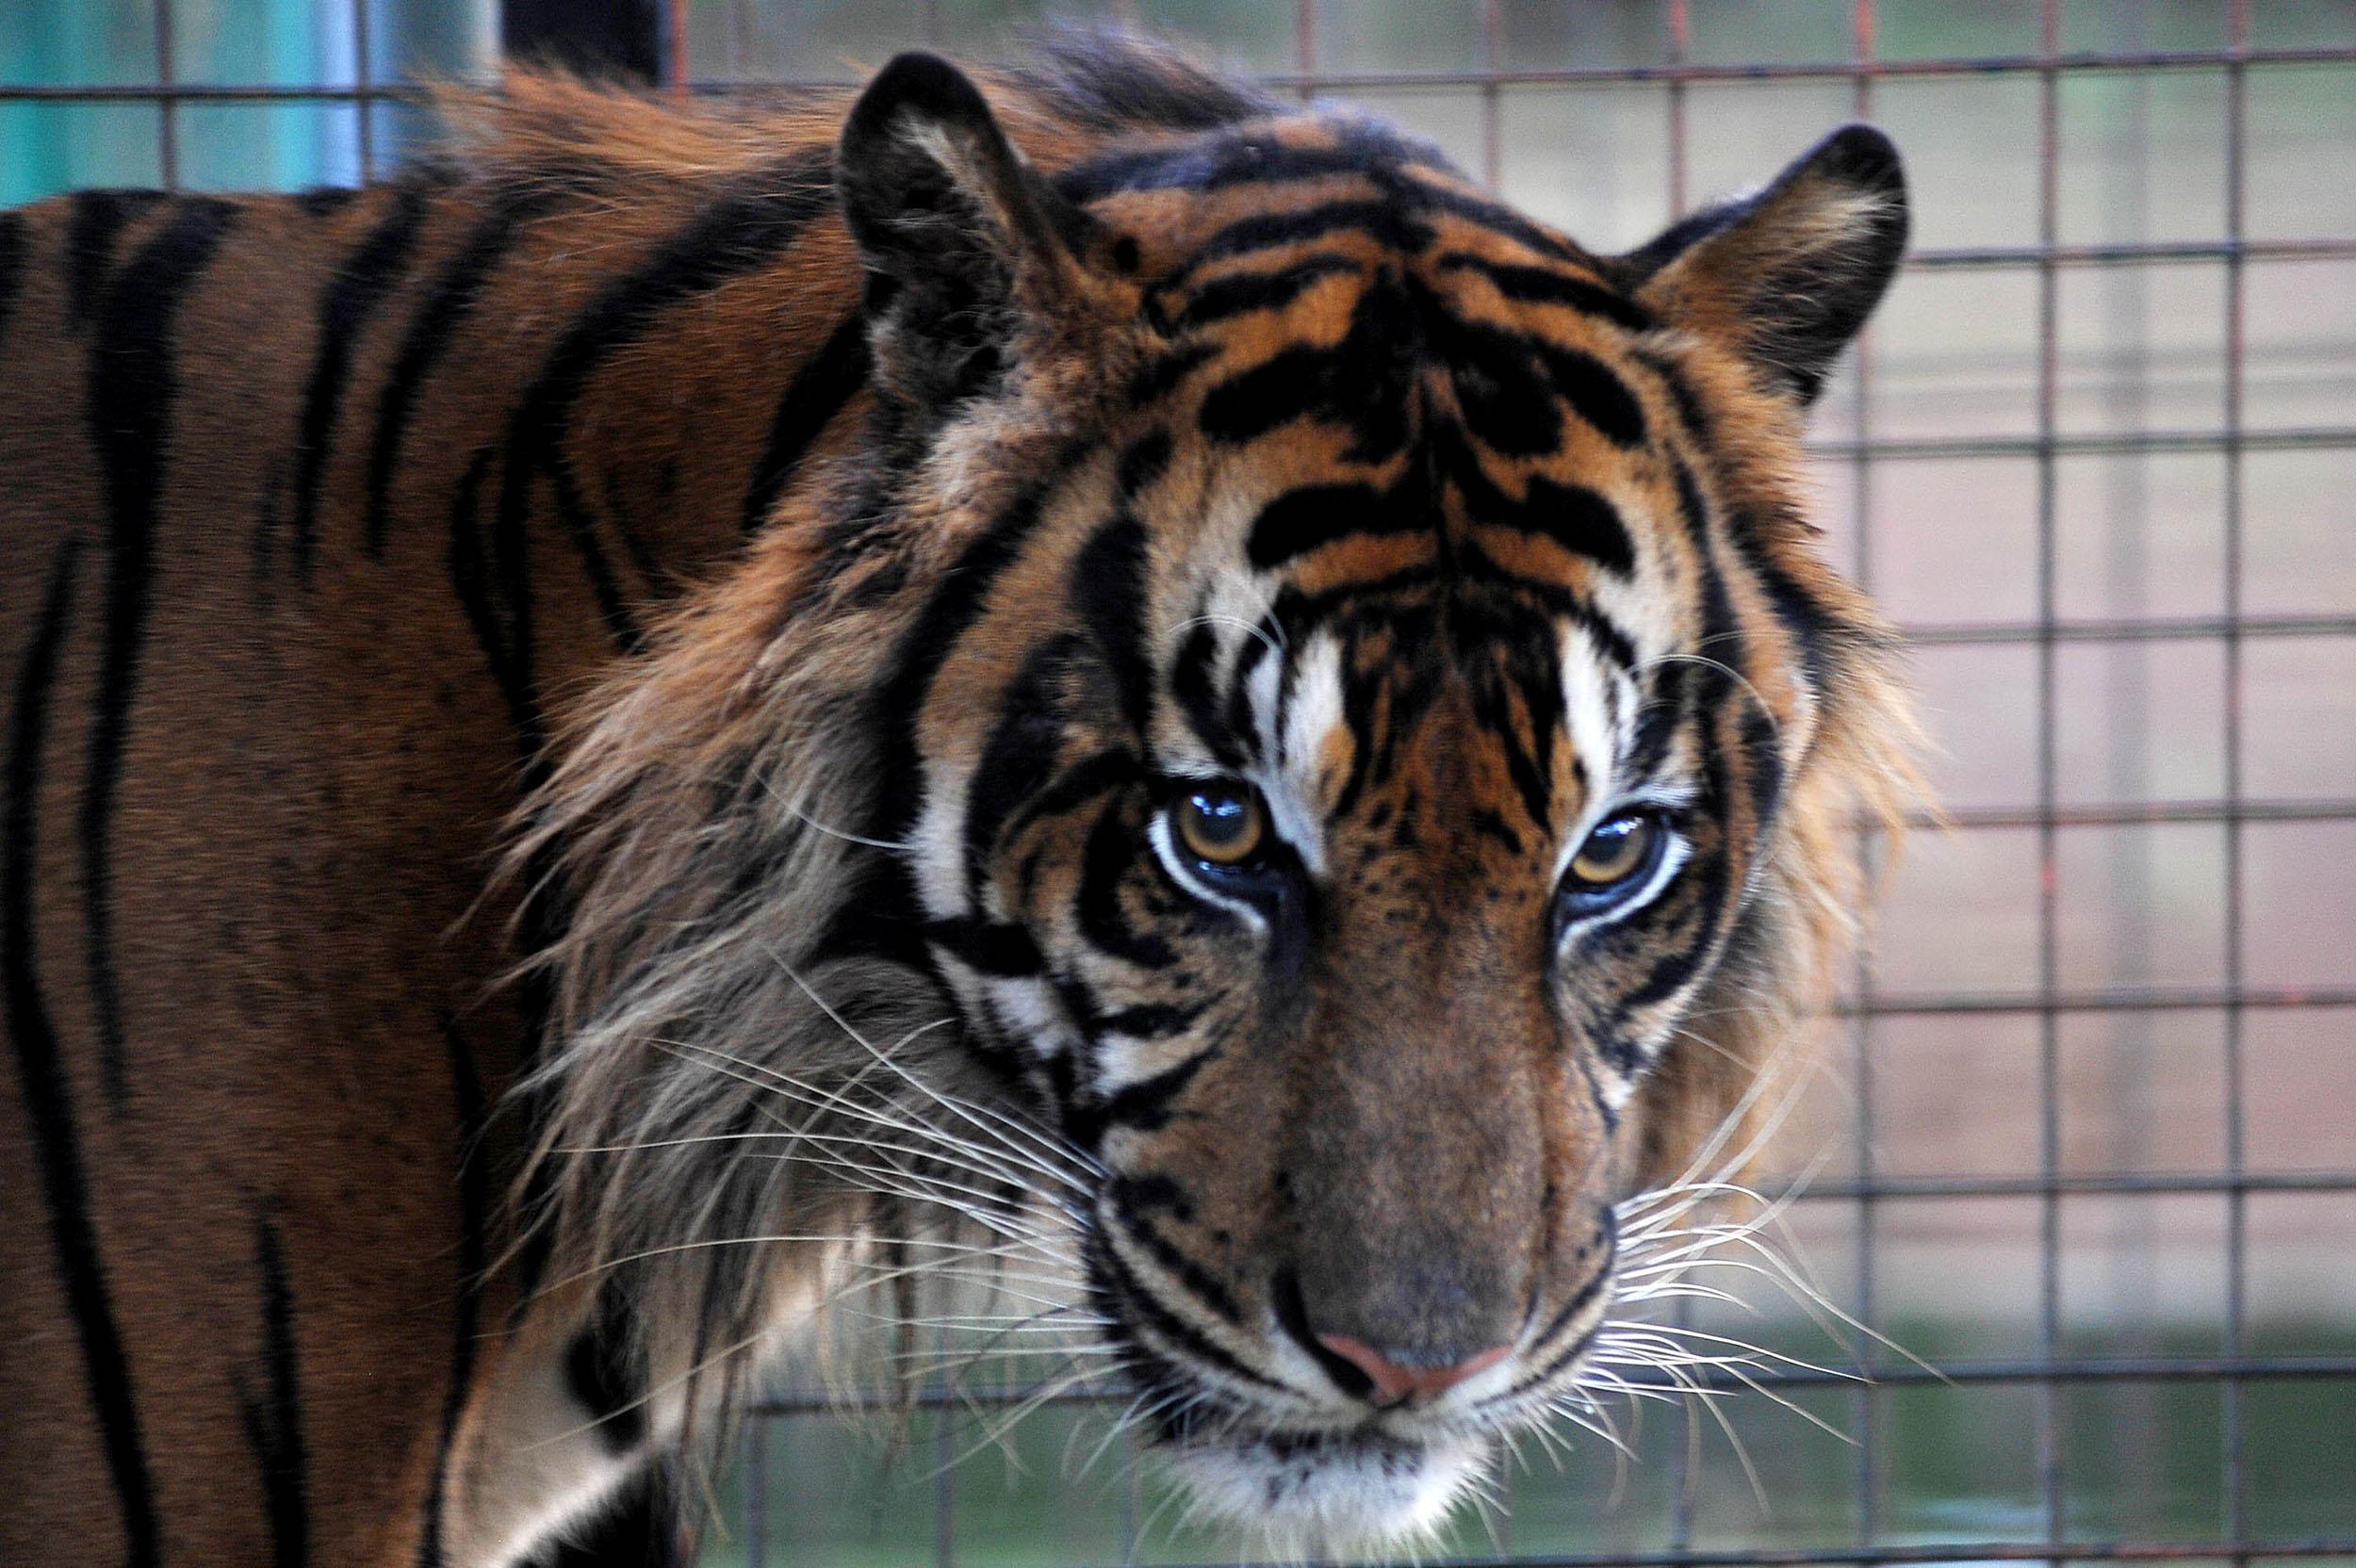 tiger at prom miami school faces backlash for bringing exotic